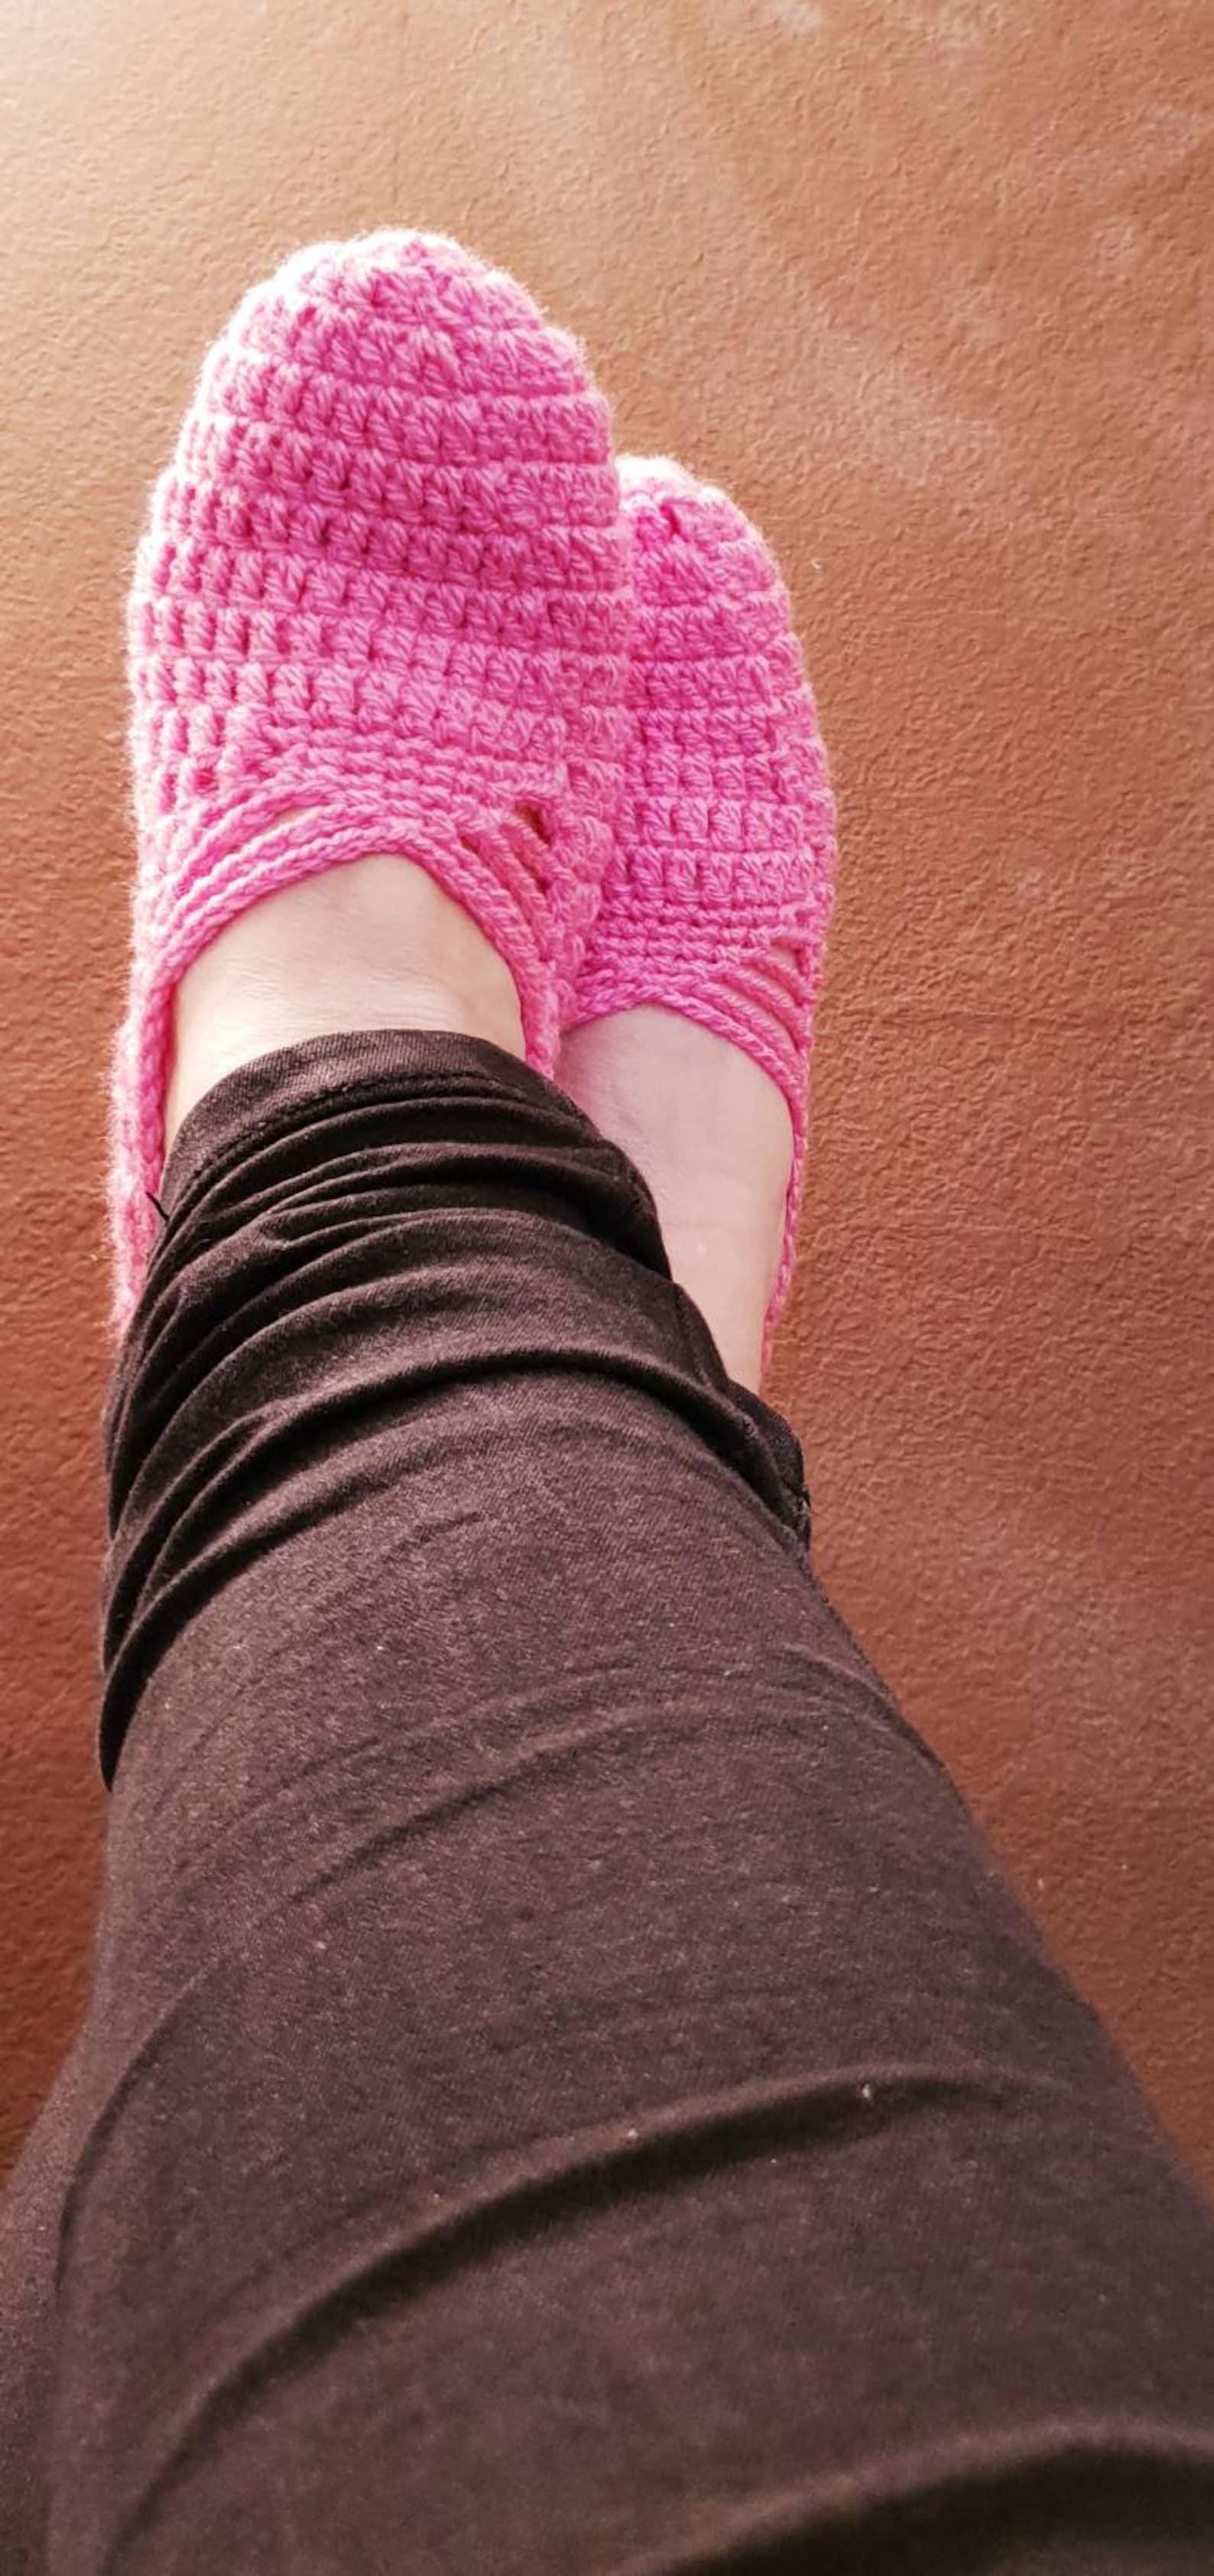 crochet ballet slippers, crochet slippers, ballet slippers, crochet ballet, non slip slippers, cute slippers, boho slippers, boh